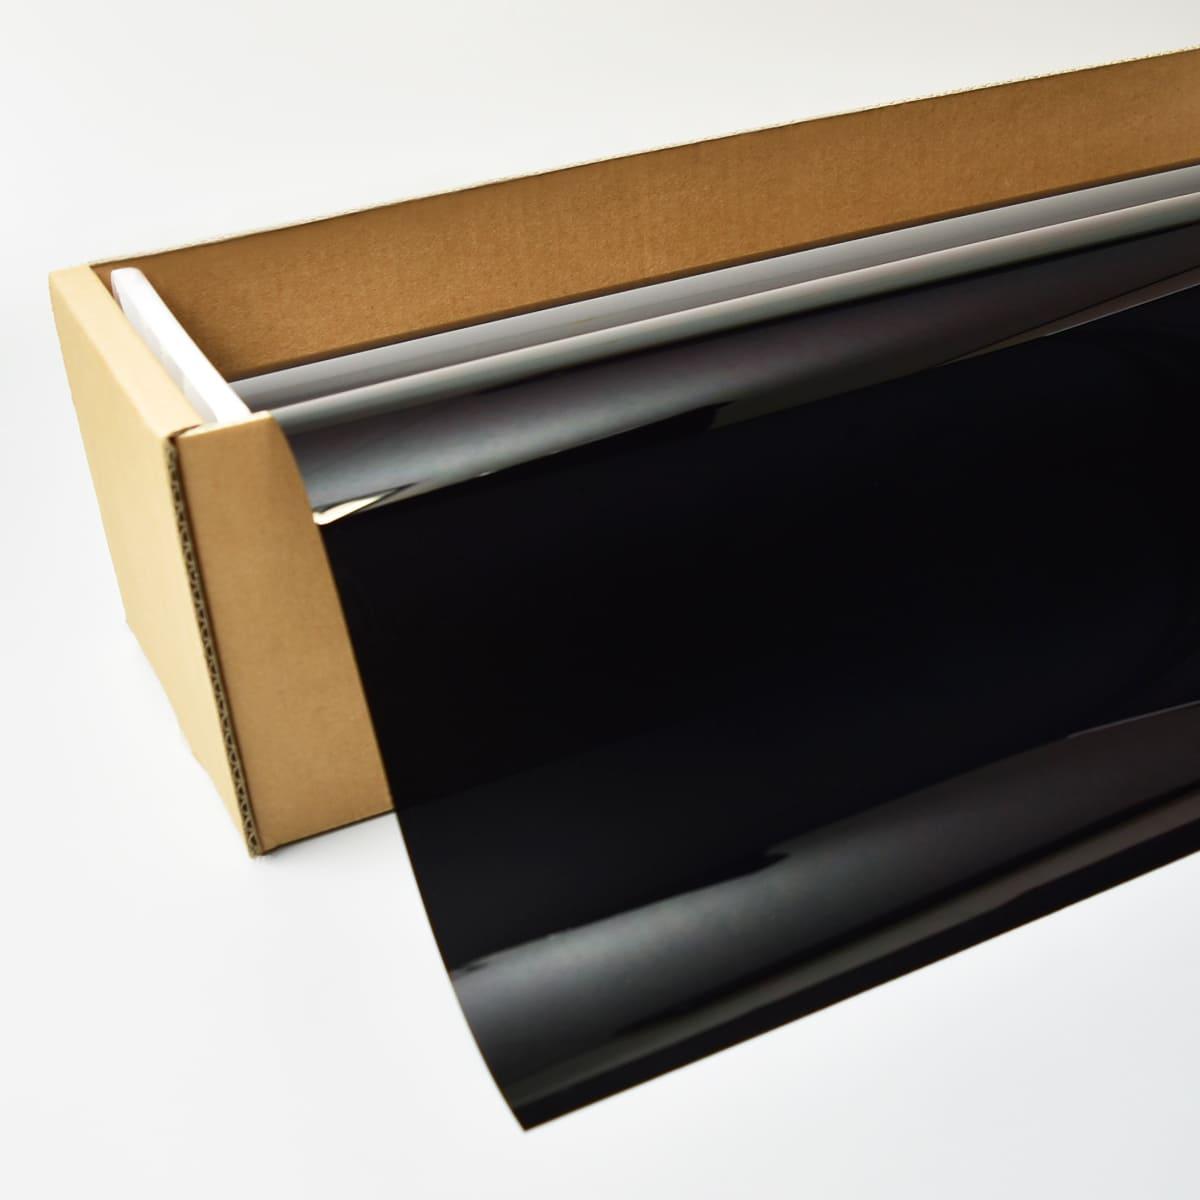 IR断熱ブラック01(1%) 1m幅 x 30mロール箱売 【シークレットブラックフィルム】 #IR-CBK0140 Roll#